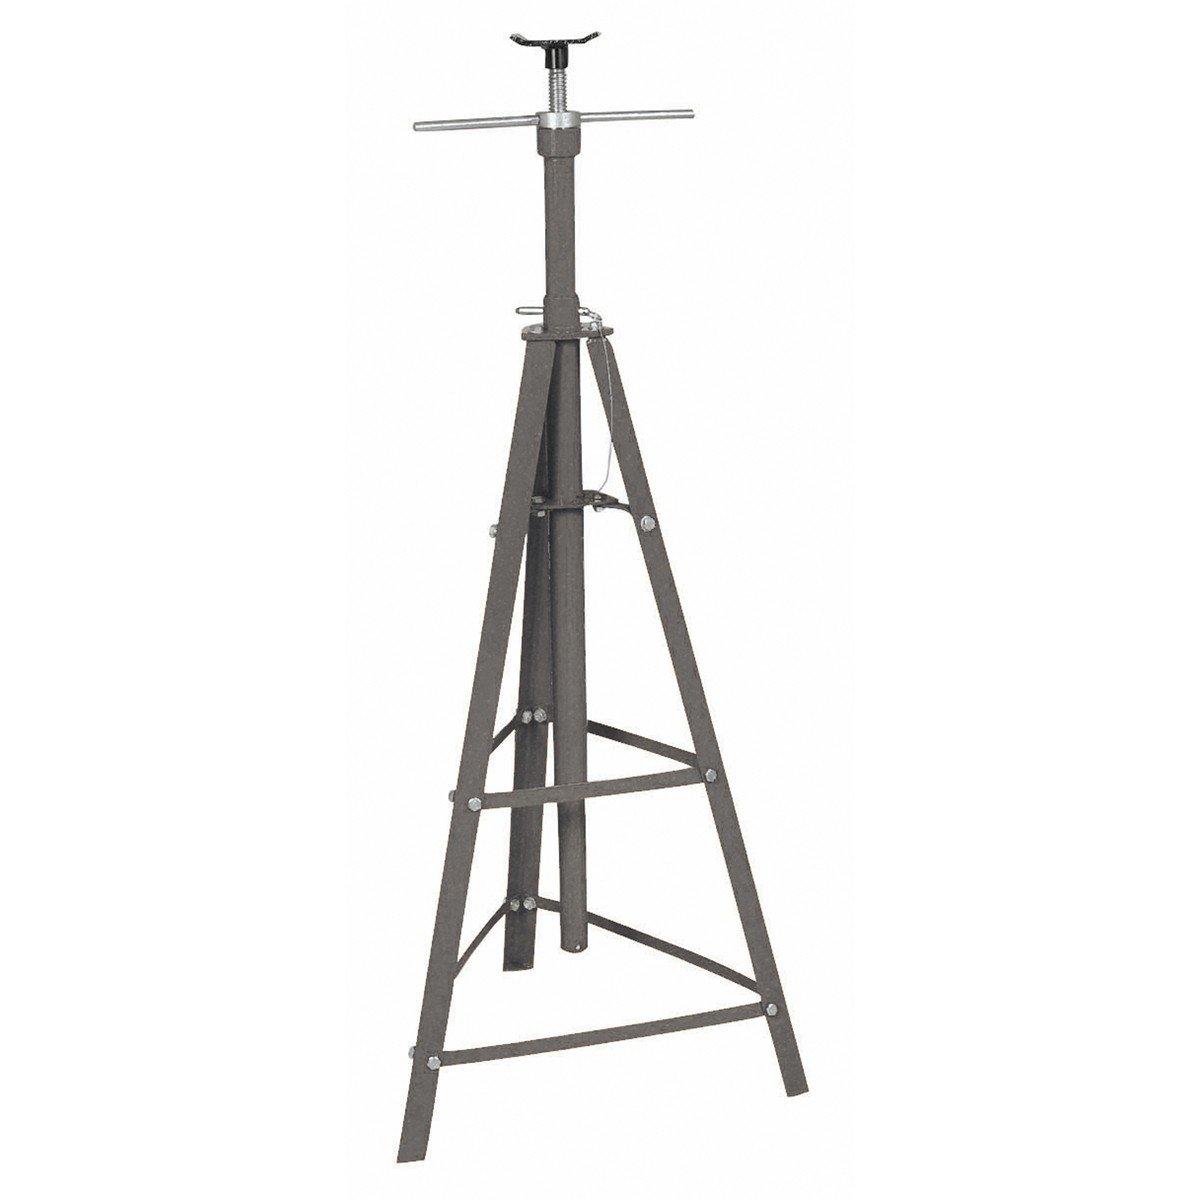 2 Ton Capacity Underhoist Safety Stand